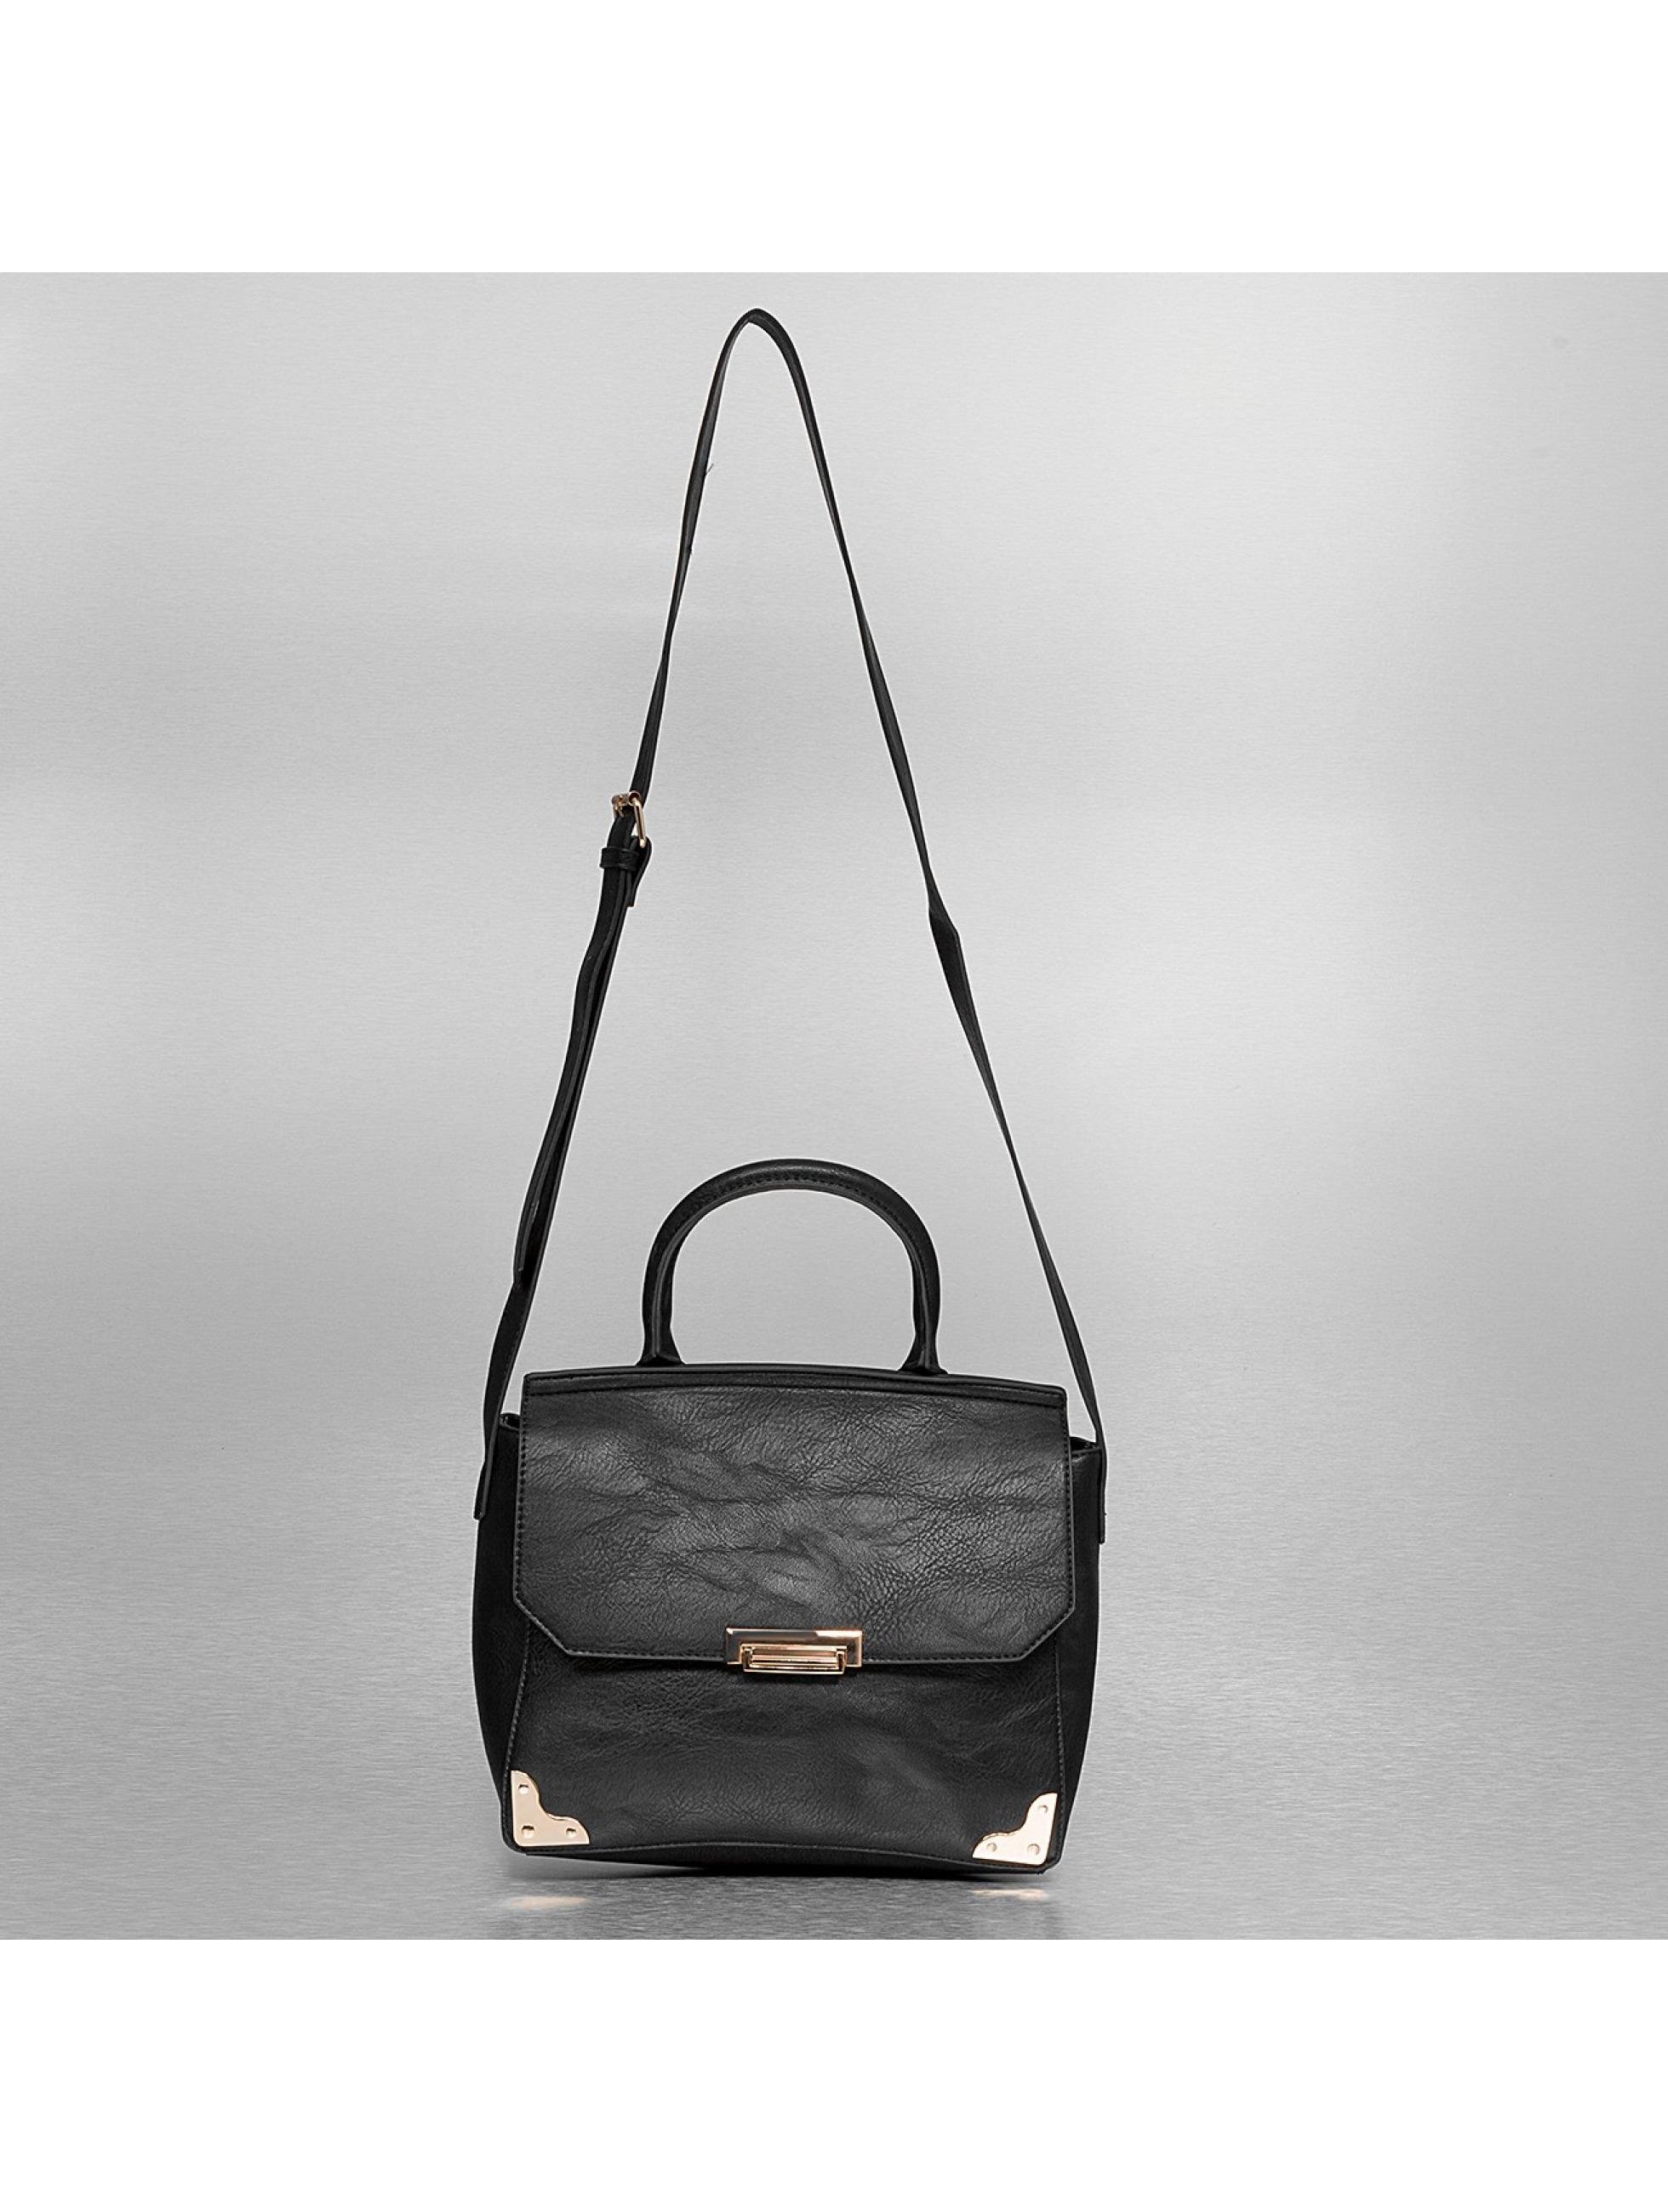 Tasche Pcaja in schwarz